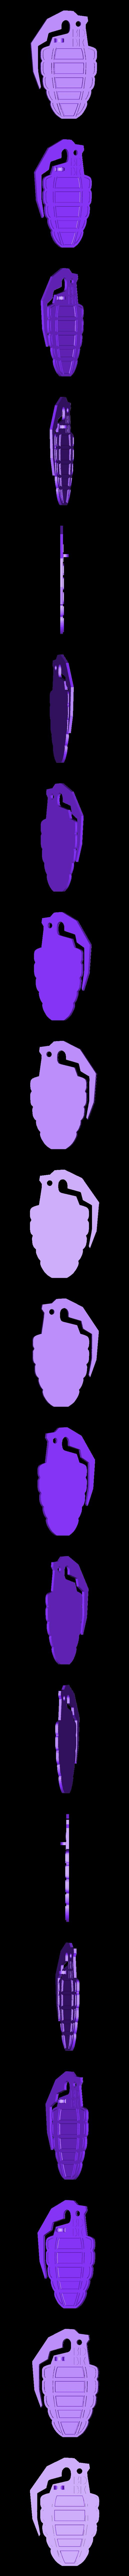 Grenade_Keychain_3.stl Download free STL file Grenade Key Clip • 3D printing design, 3DBROOKLYN